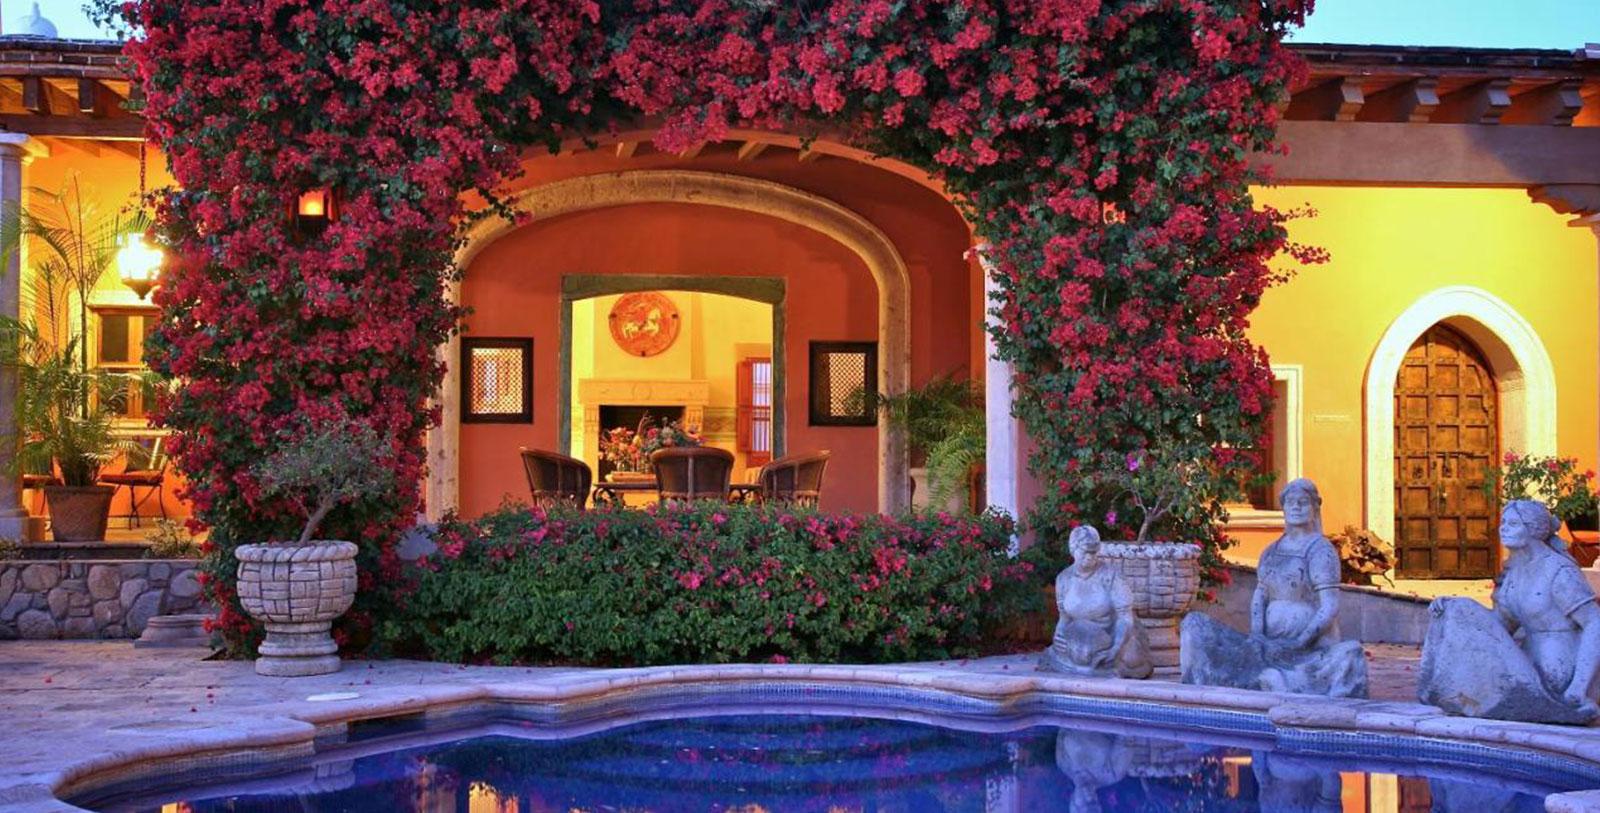 Image of Pool Exterior, Hacienda de los Santos, Alamos, Mexico, 1600s, Member of Historic Hotels Worldwide, Overview